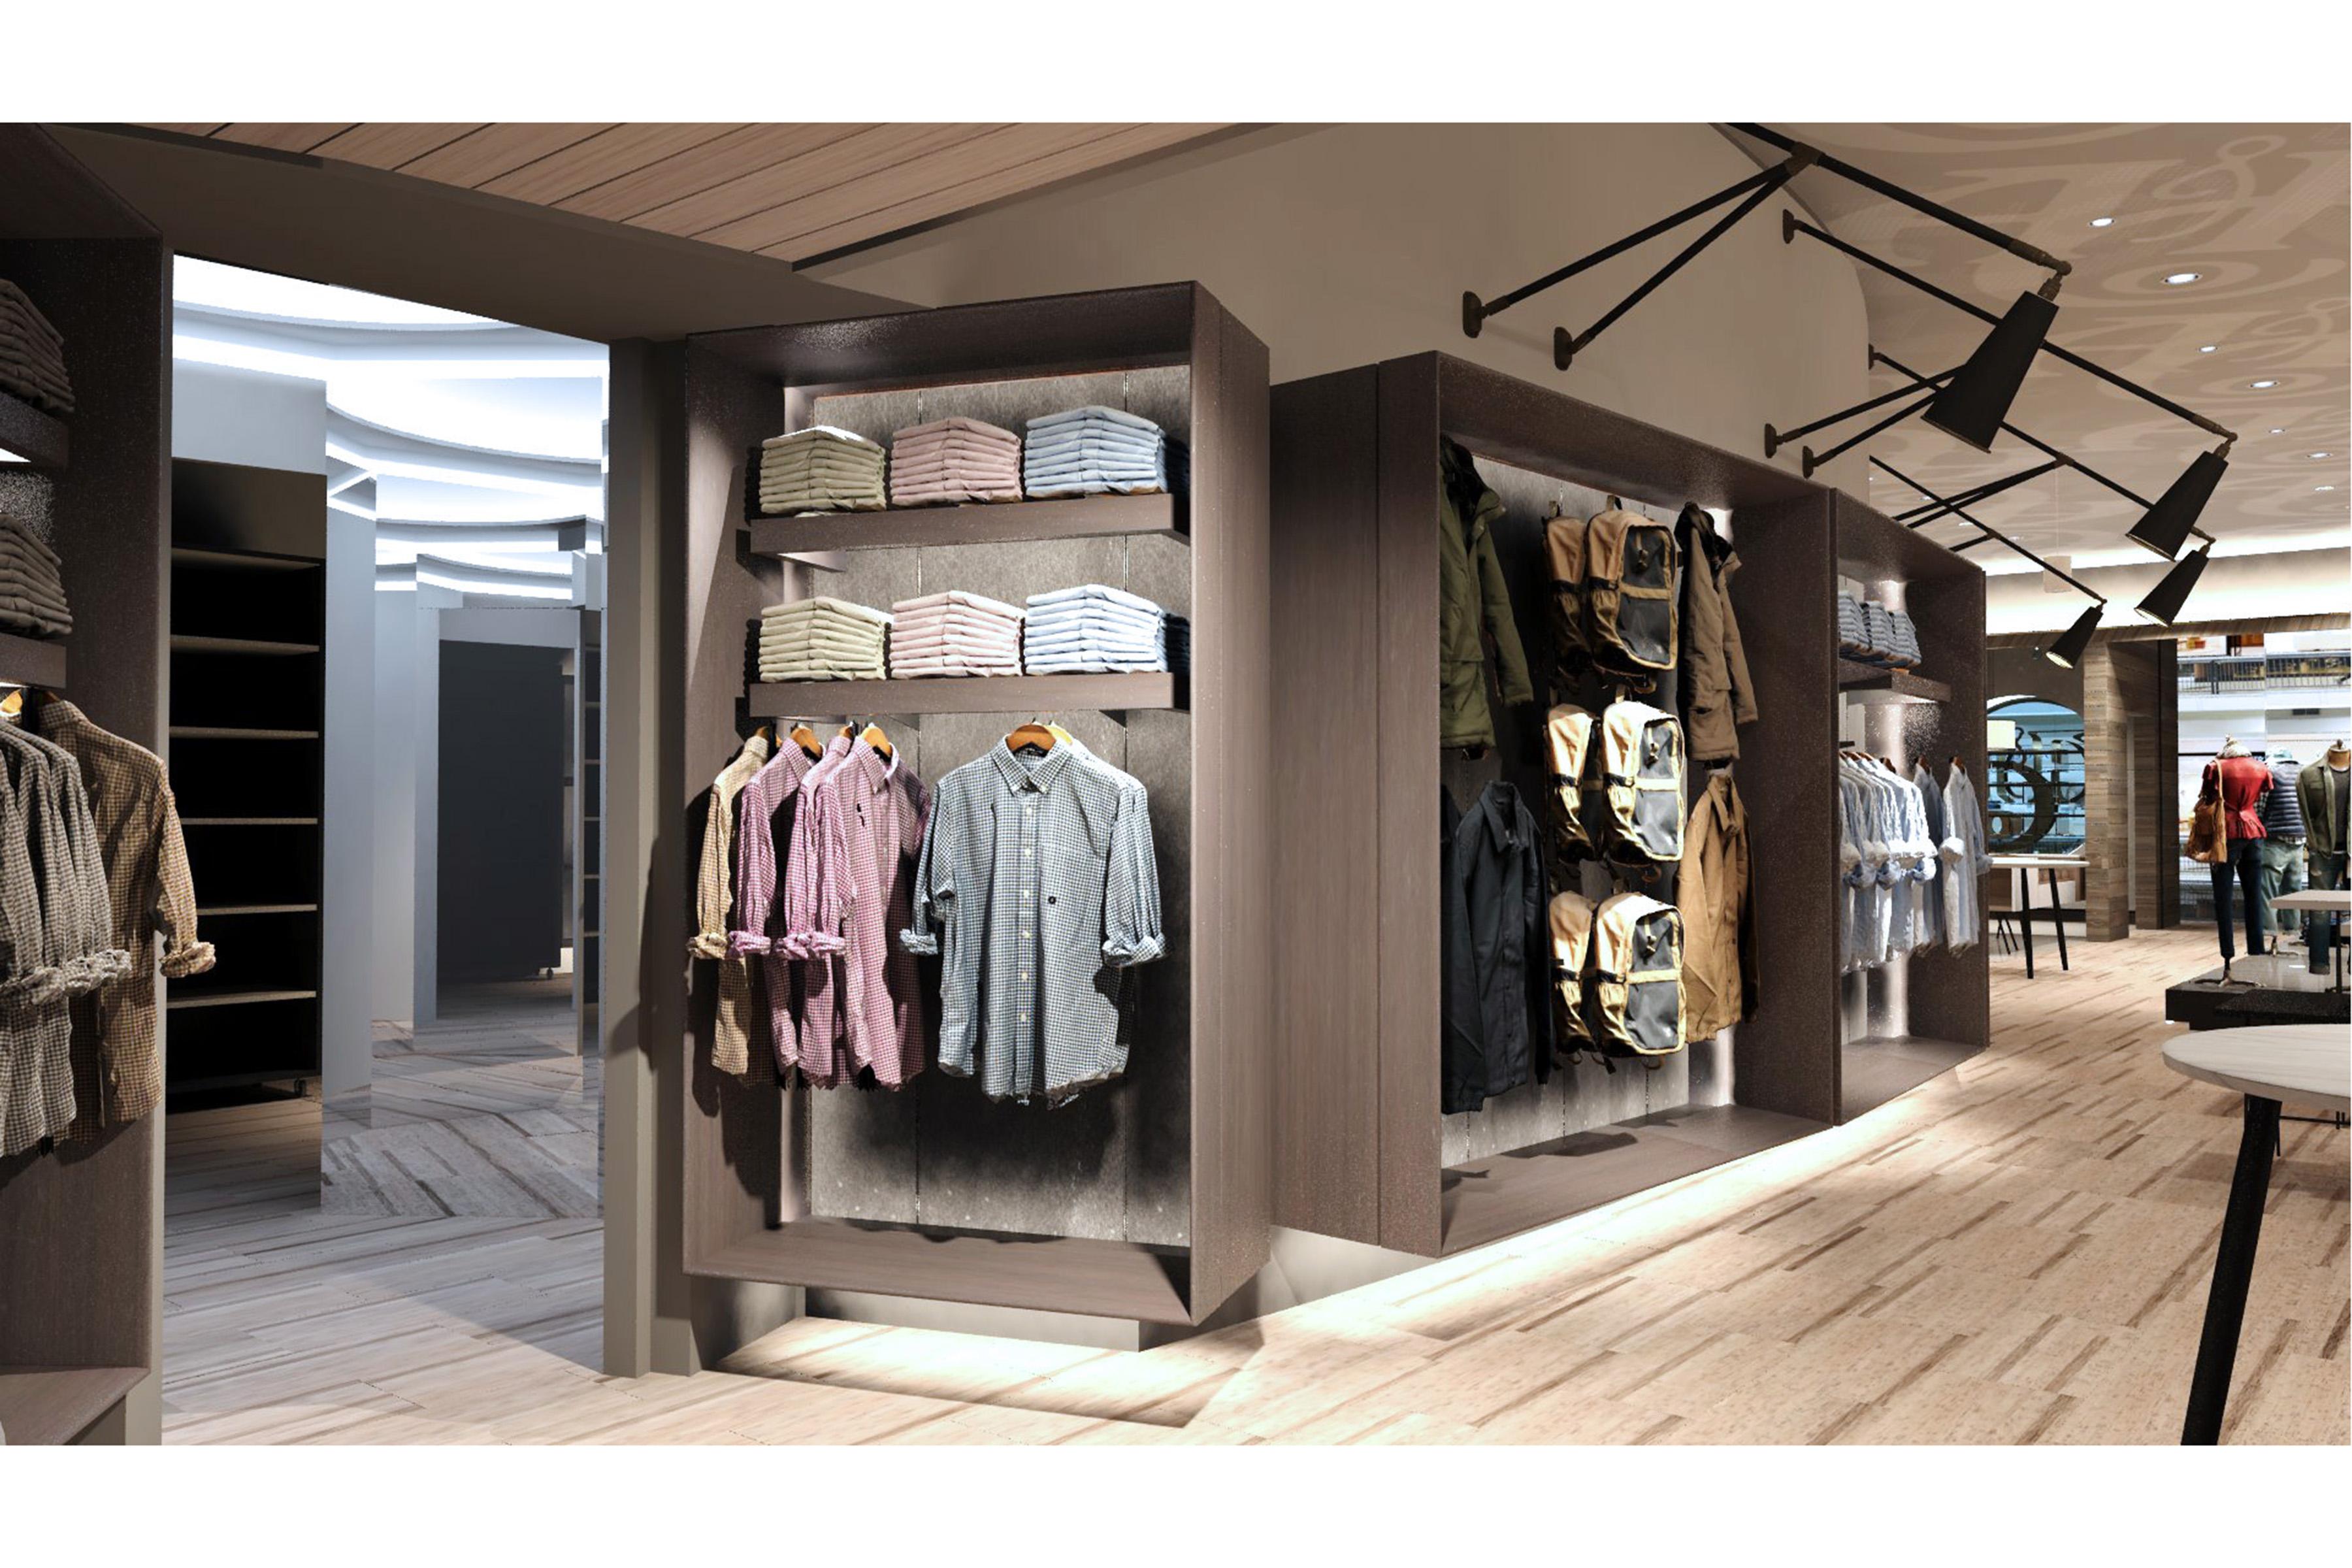 The Abercrombie & Fitch store prototype in Columbus, Ohio.